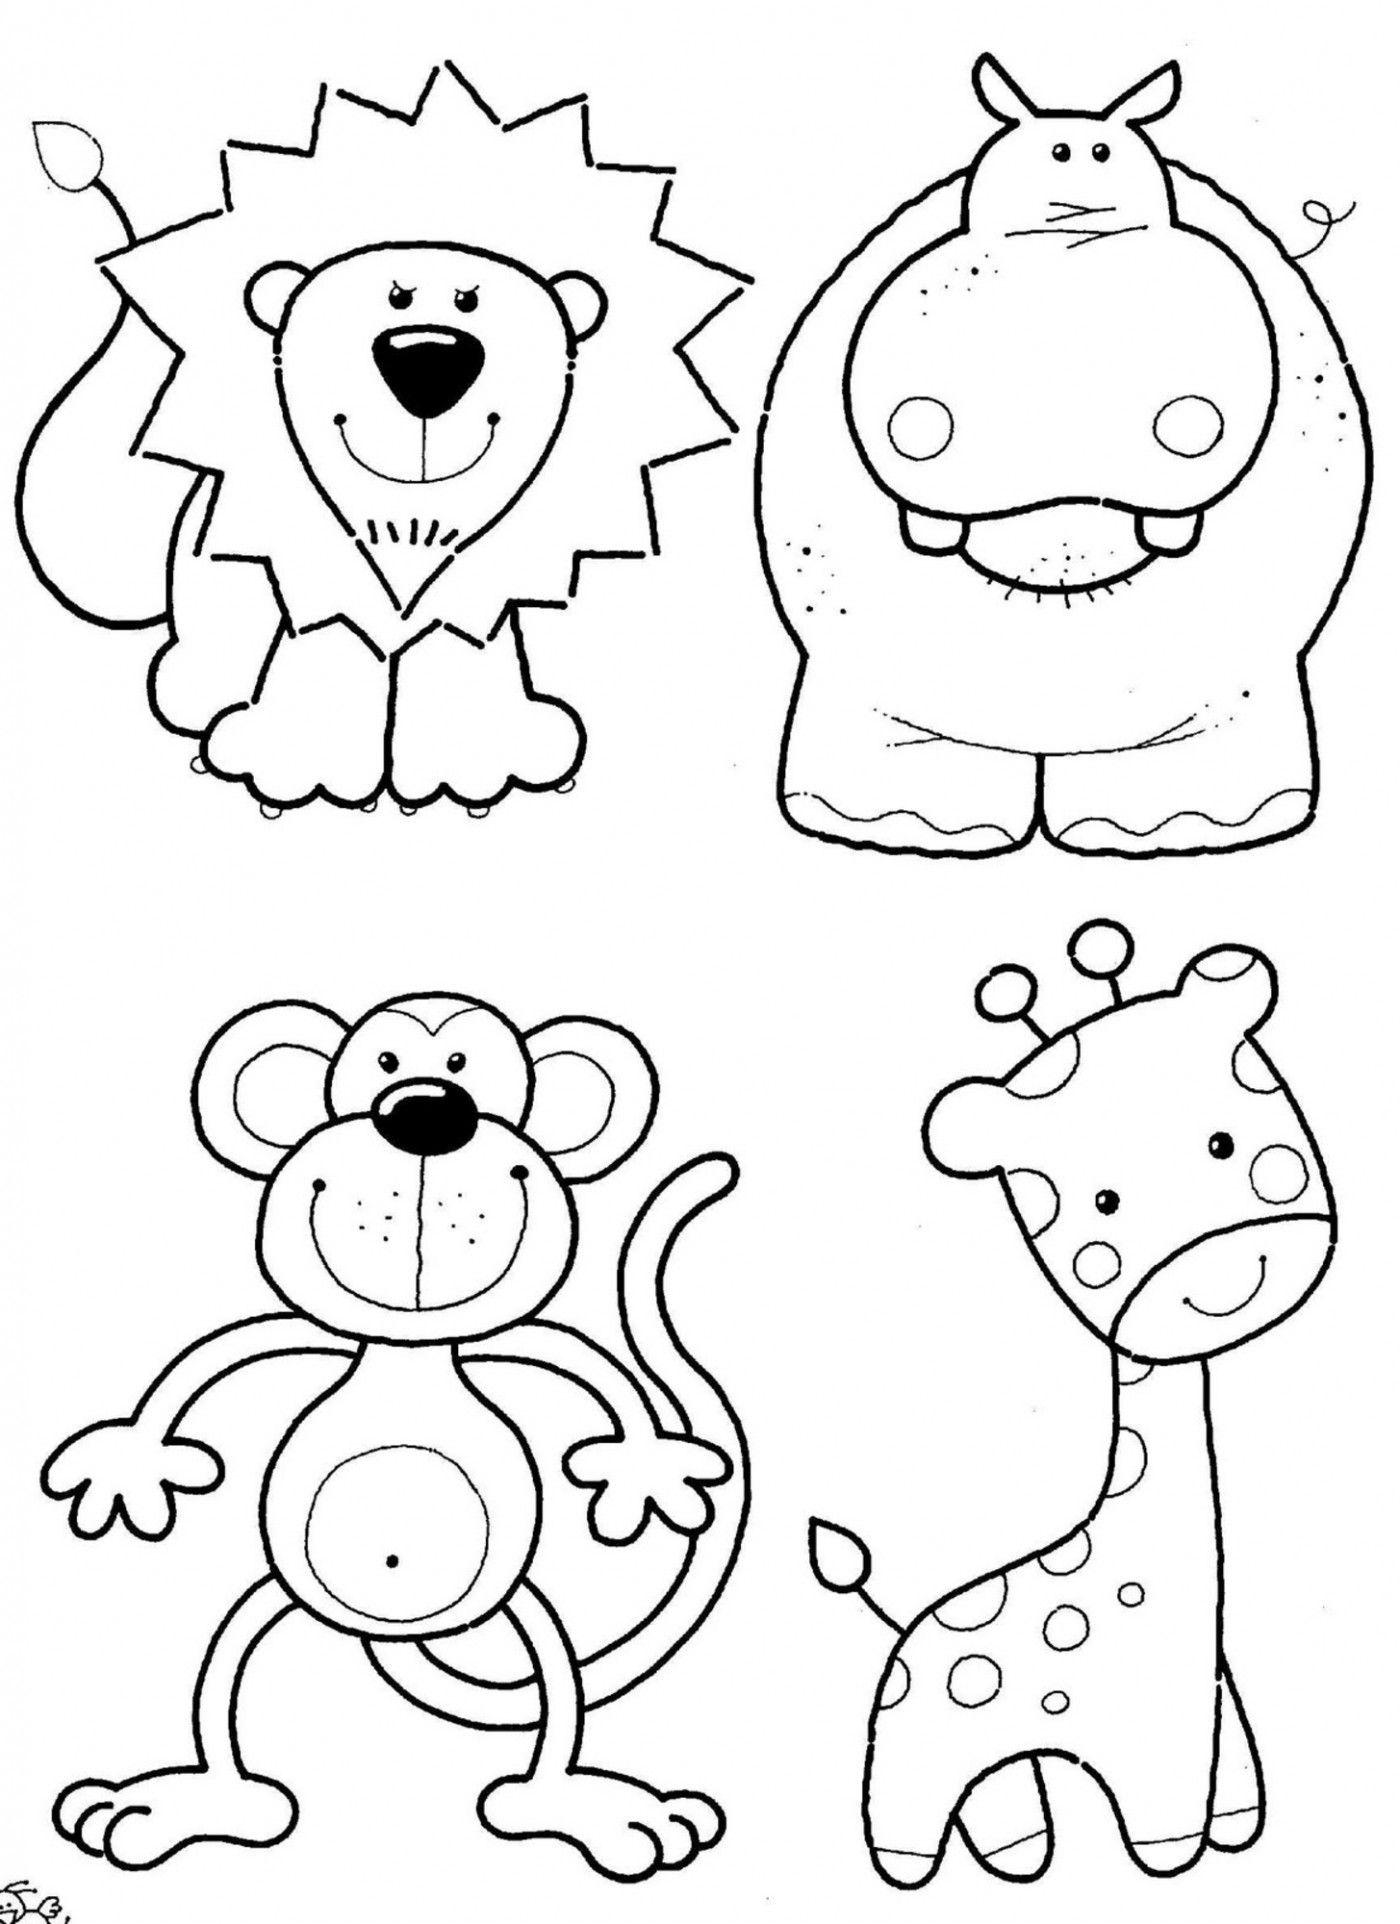 Animal Coloring Pages (14)   Zoo animal coloring pages ...   colouring pages for zoo animals